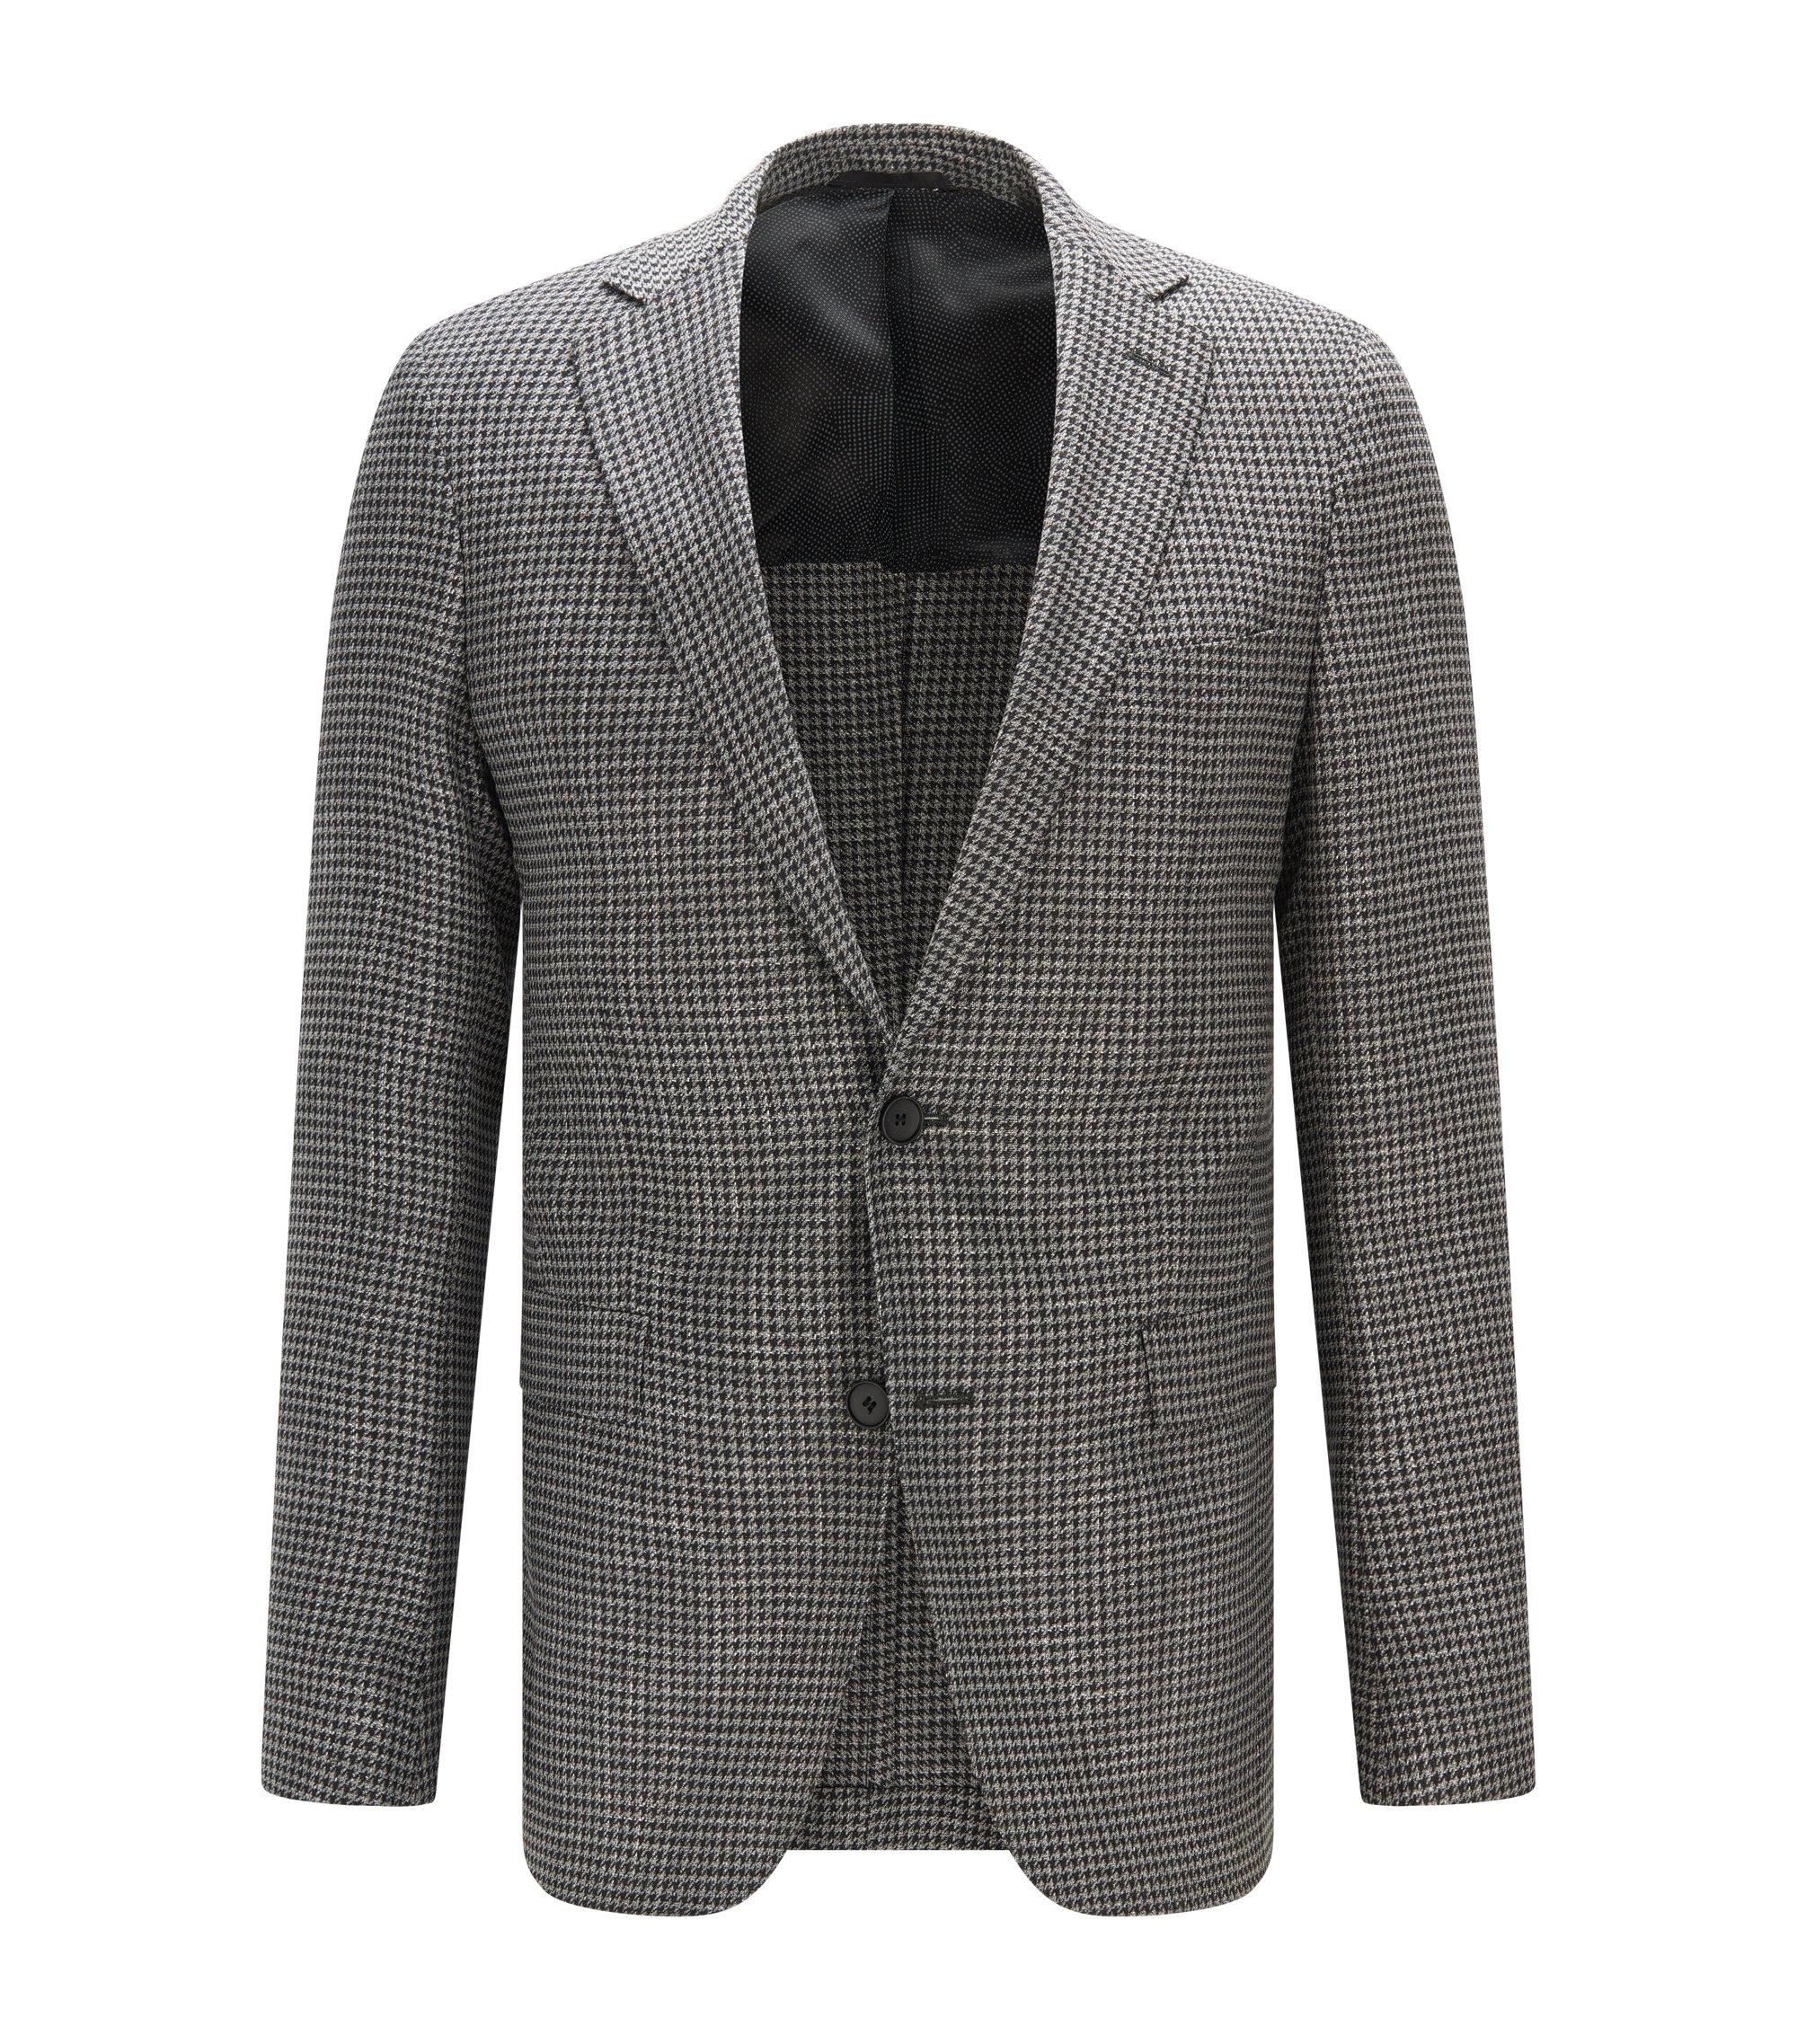 Houndstooth Stretch Virgin Wool Sport Coat, Extra Slim Fit | Roan, Open Grey